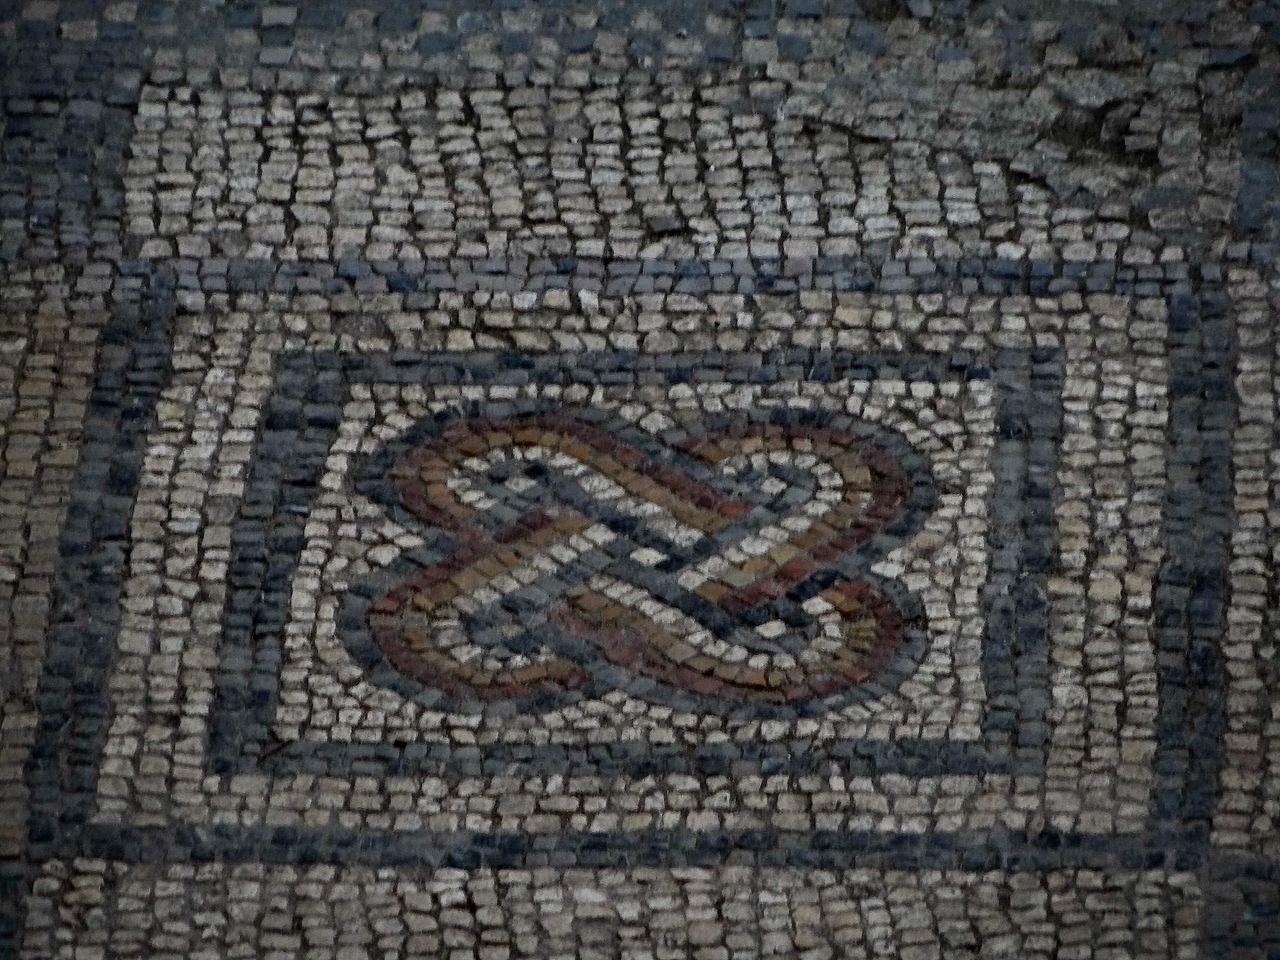 Podni mozaik Carske palate u Sirmijumu, foto: Dekanski / Wikimedia